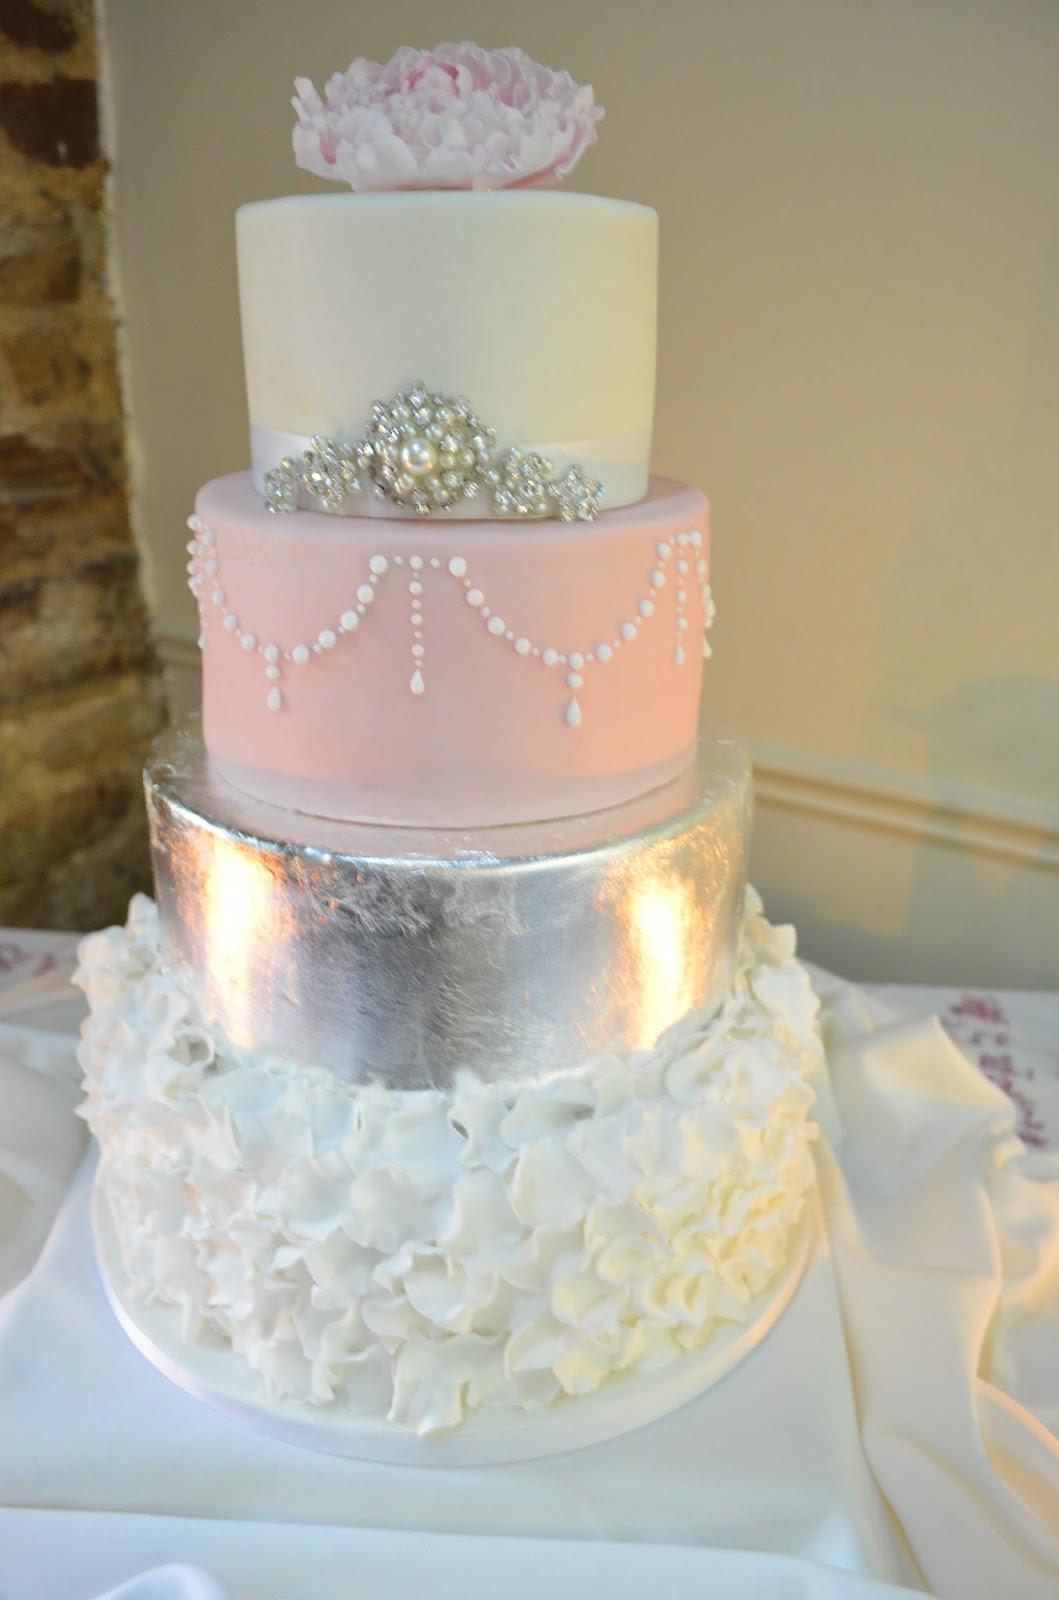 Kiss Me Cake Bakery Weddings - Create Your Wedding Cake